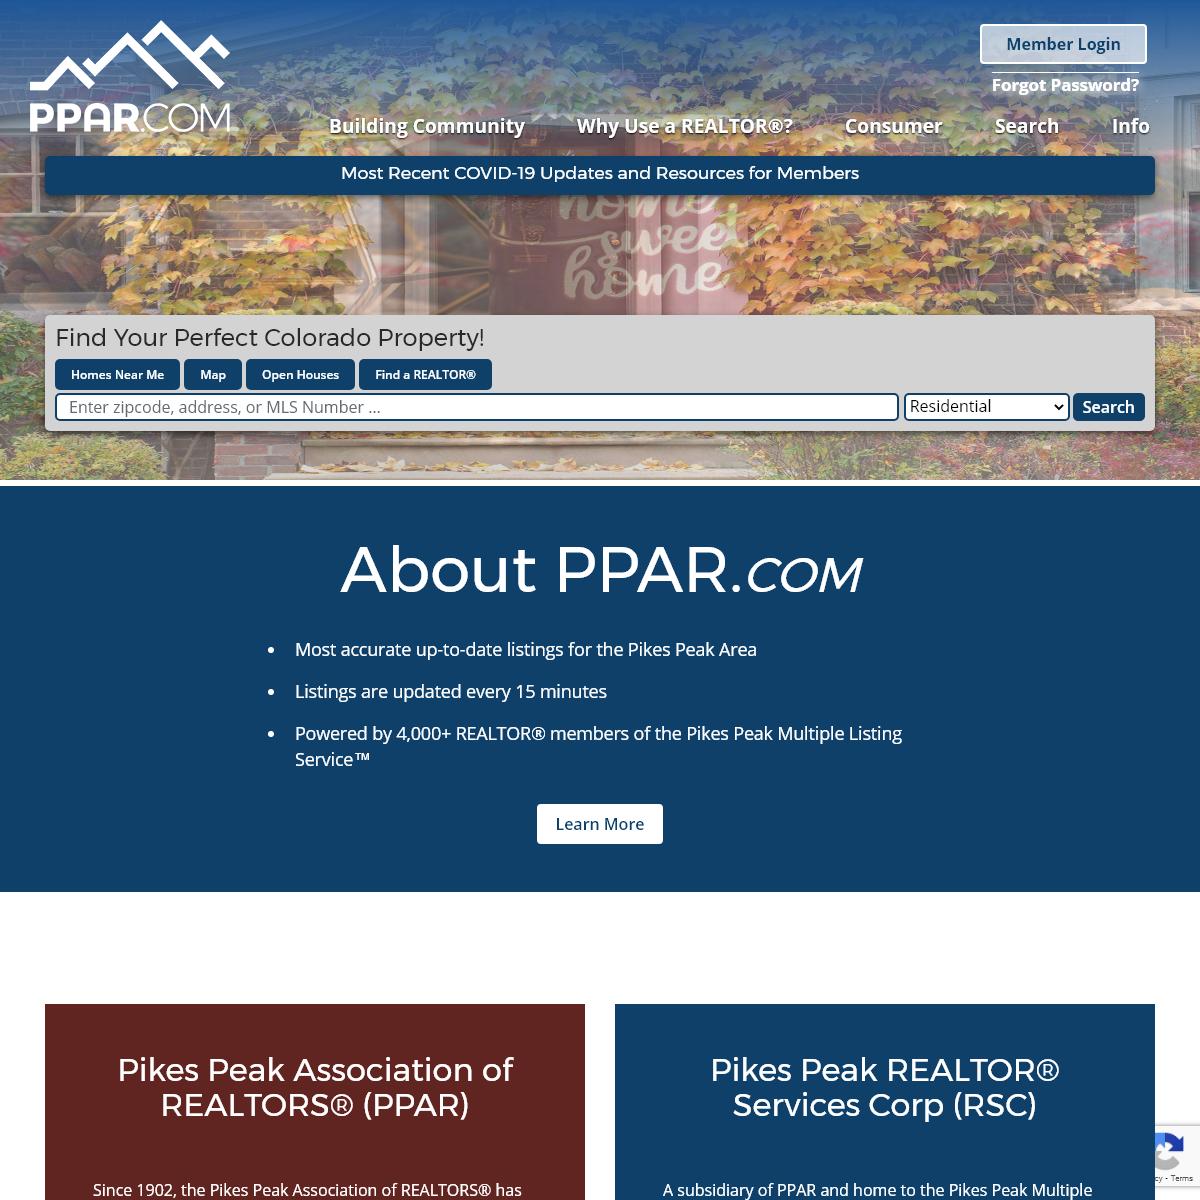 Pikes Peak Association of Realtors® (PPAR) - Pikes Peak Multiple Listing Service™ (MLS)